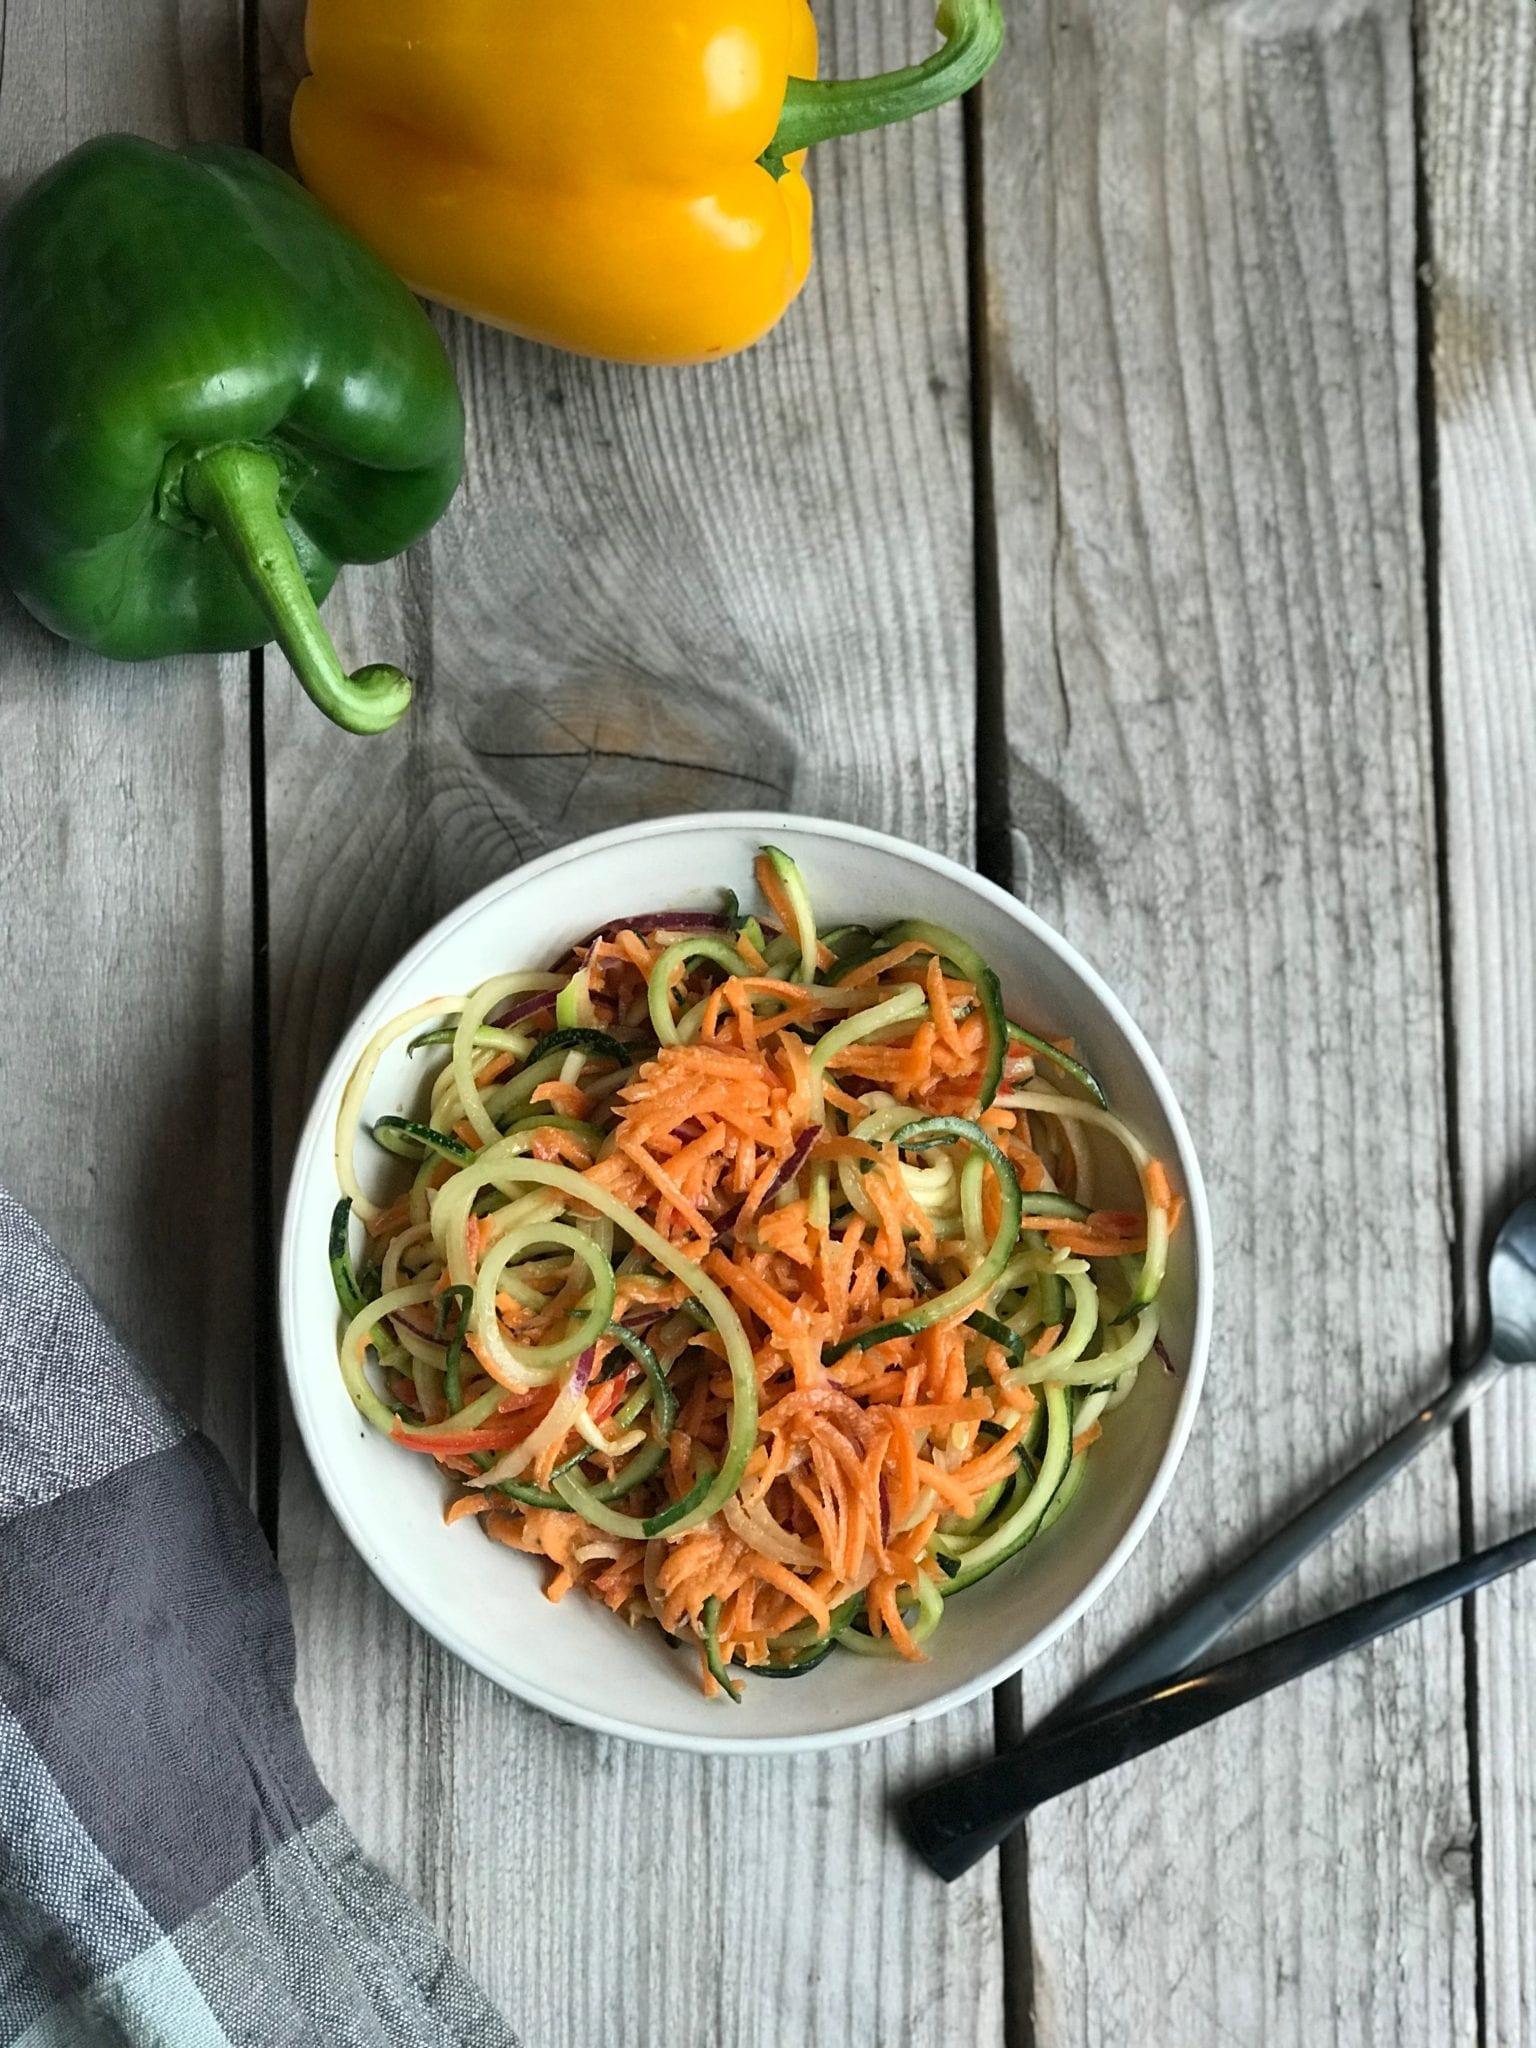 FullSizeRender 2 kopi Spiralizer salat med peanut dressing